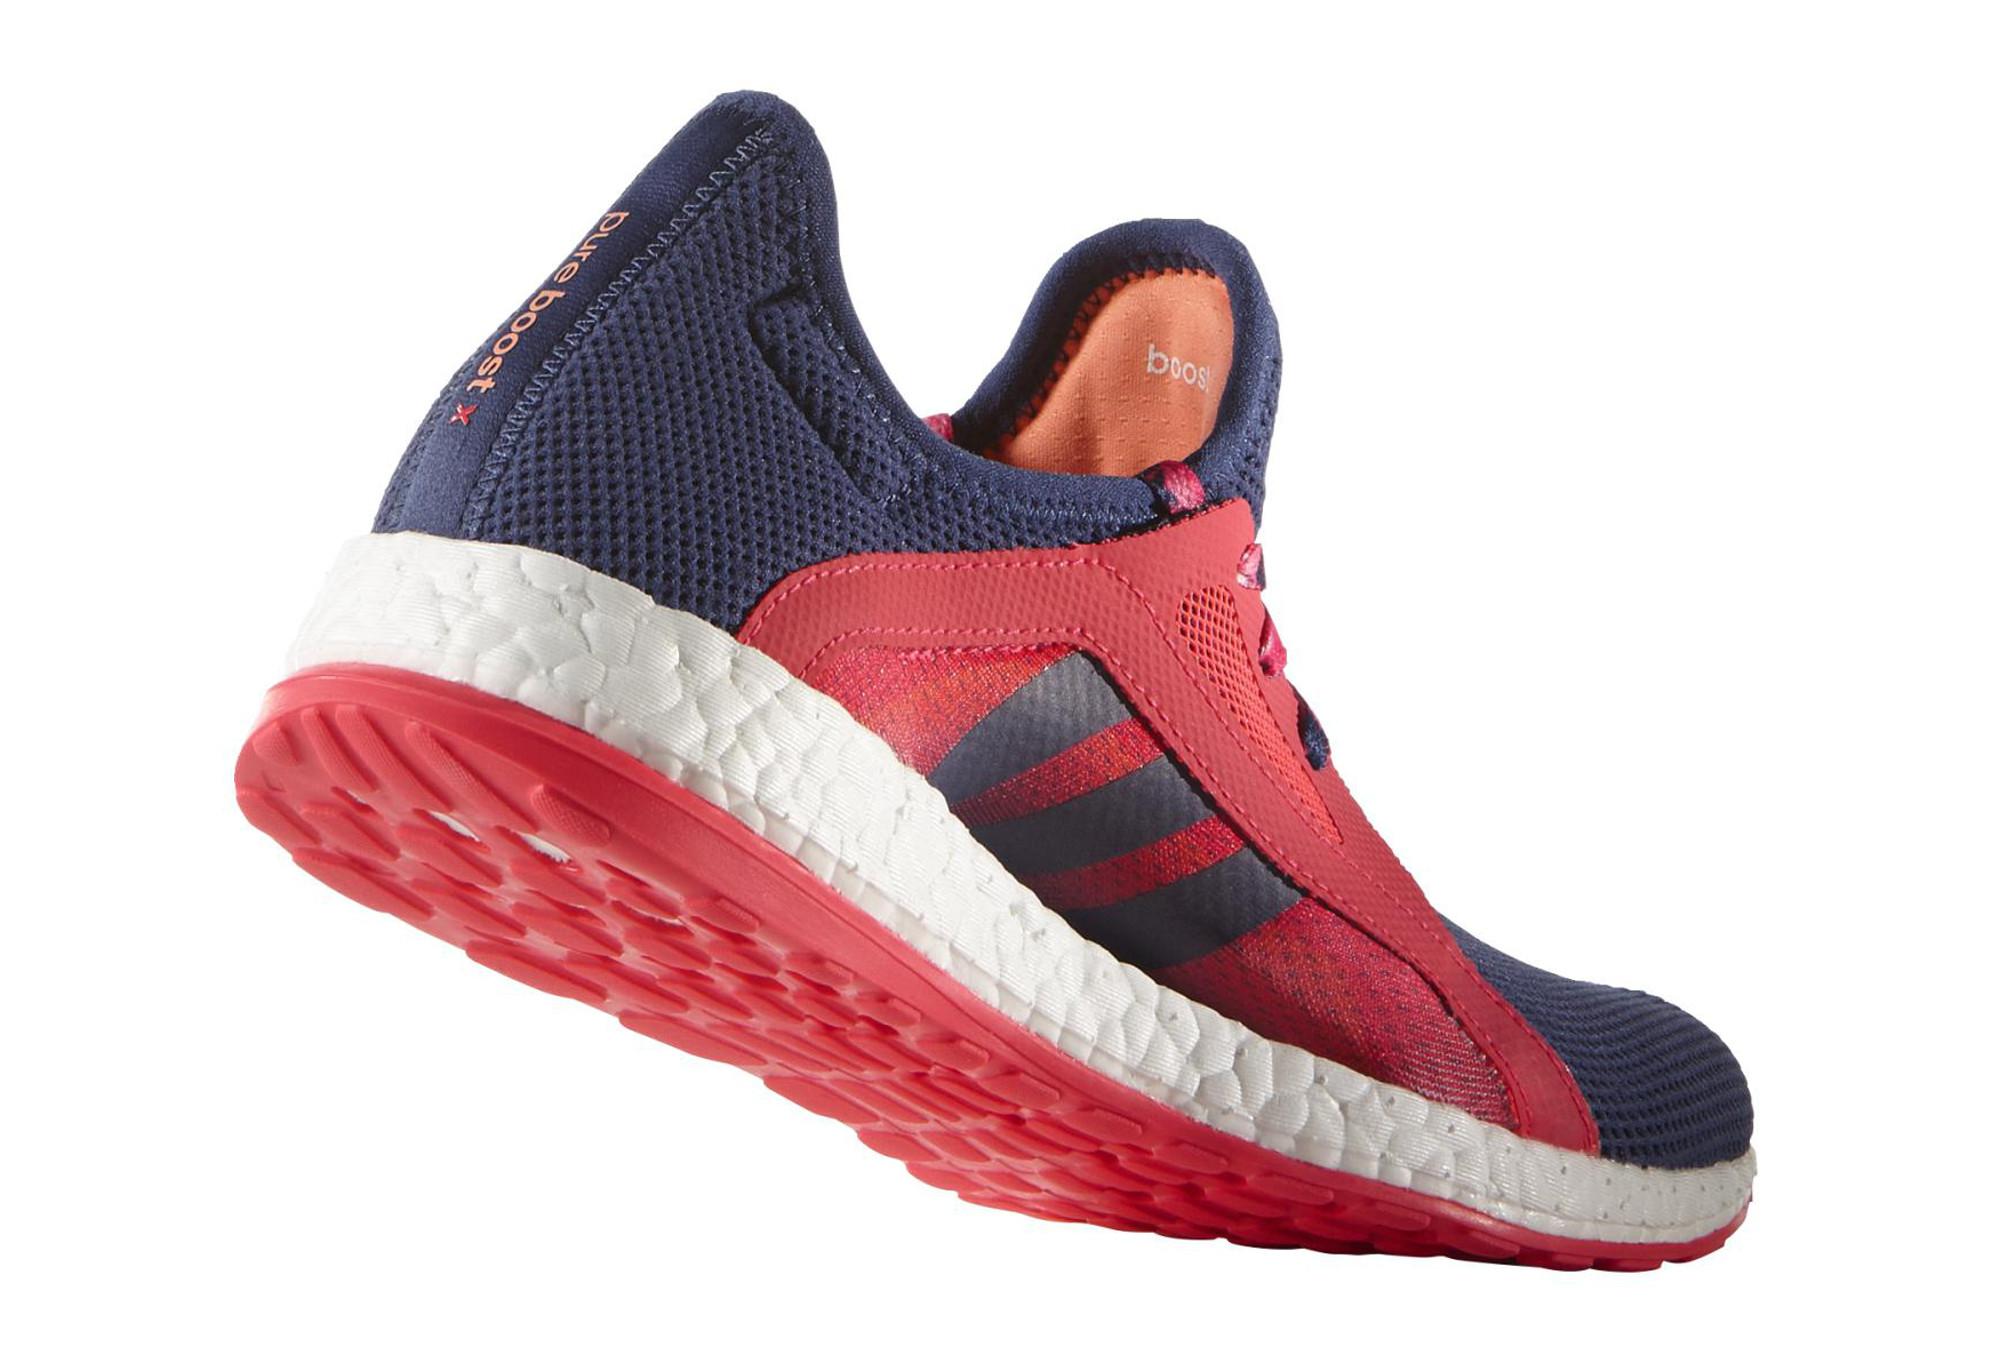 Adidas Pure Boost morado